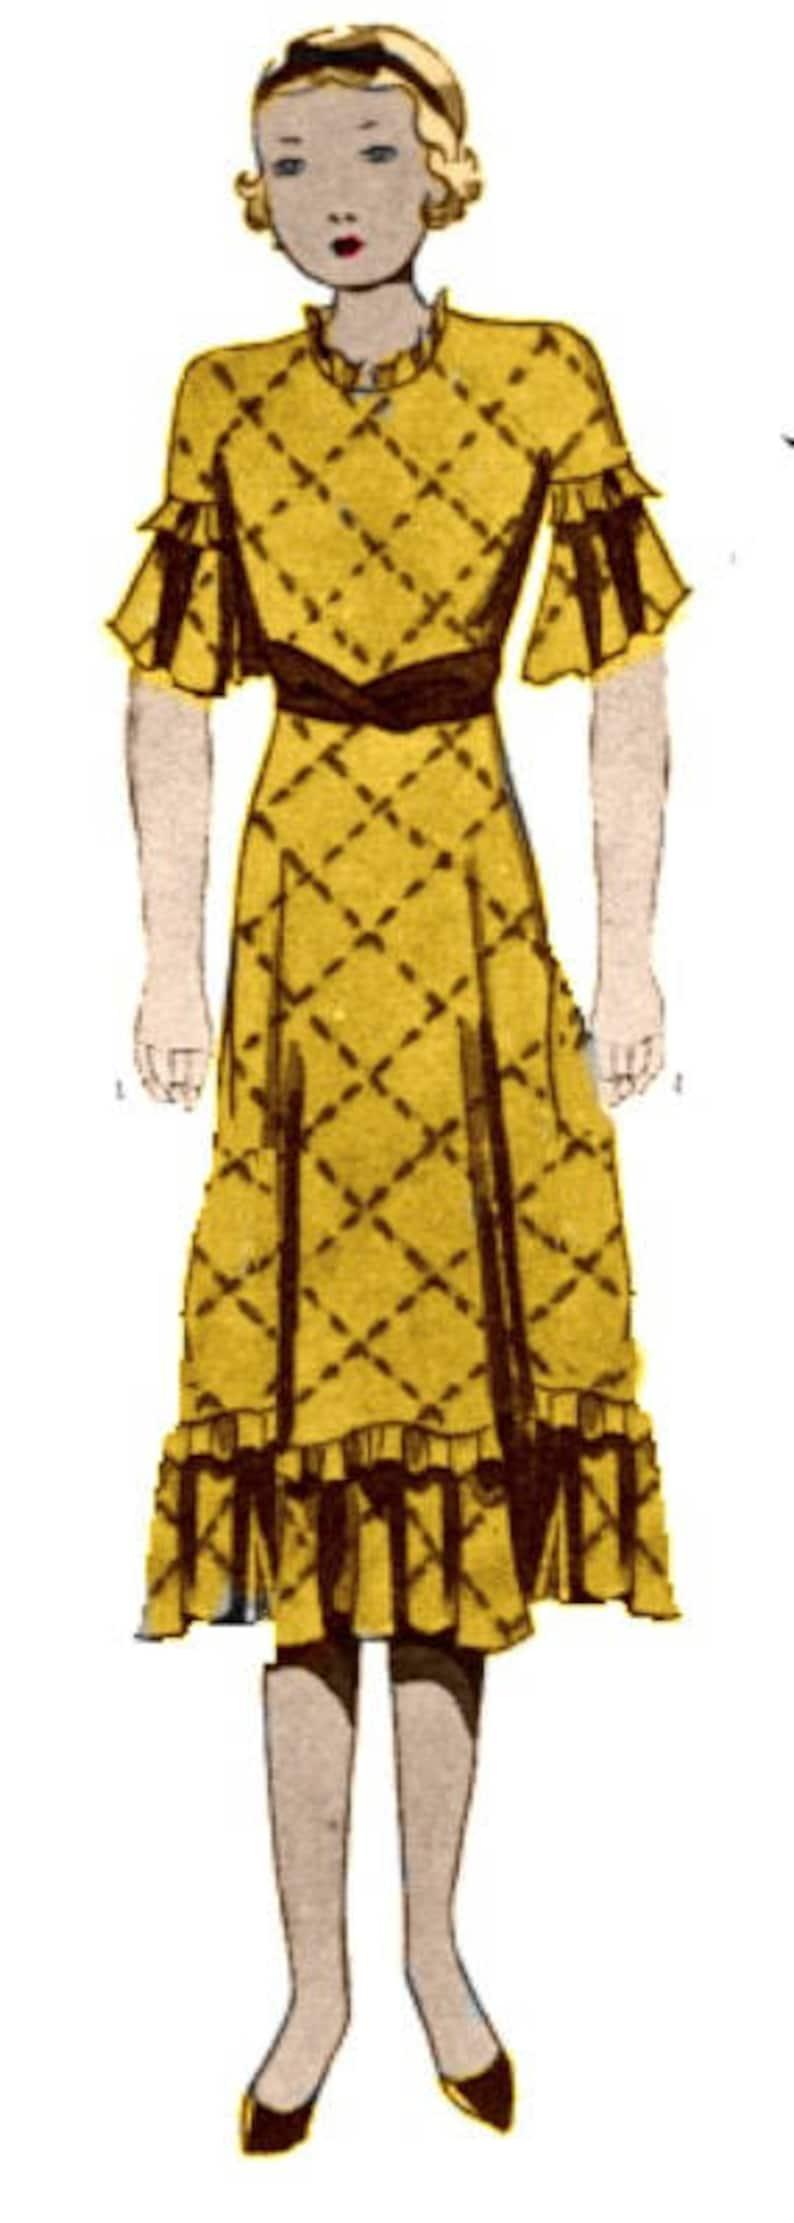 1930s Sewing Patterns- Dresses, Pants, Tops Plus Size (or any size) Vintage 1934 Dress Sewing Pattern - PDF - Pattern 1578 - Carlene 1930s 30s Retro Instant Download $11.20 AT vintagedancer.com